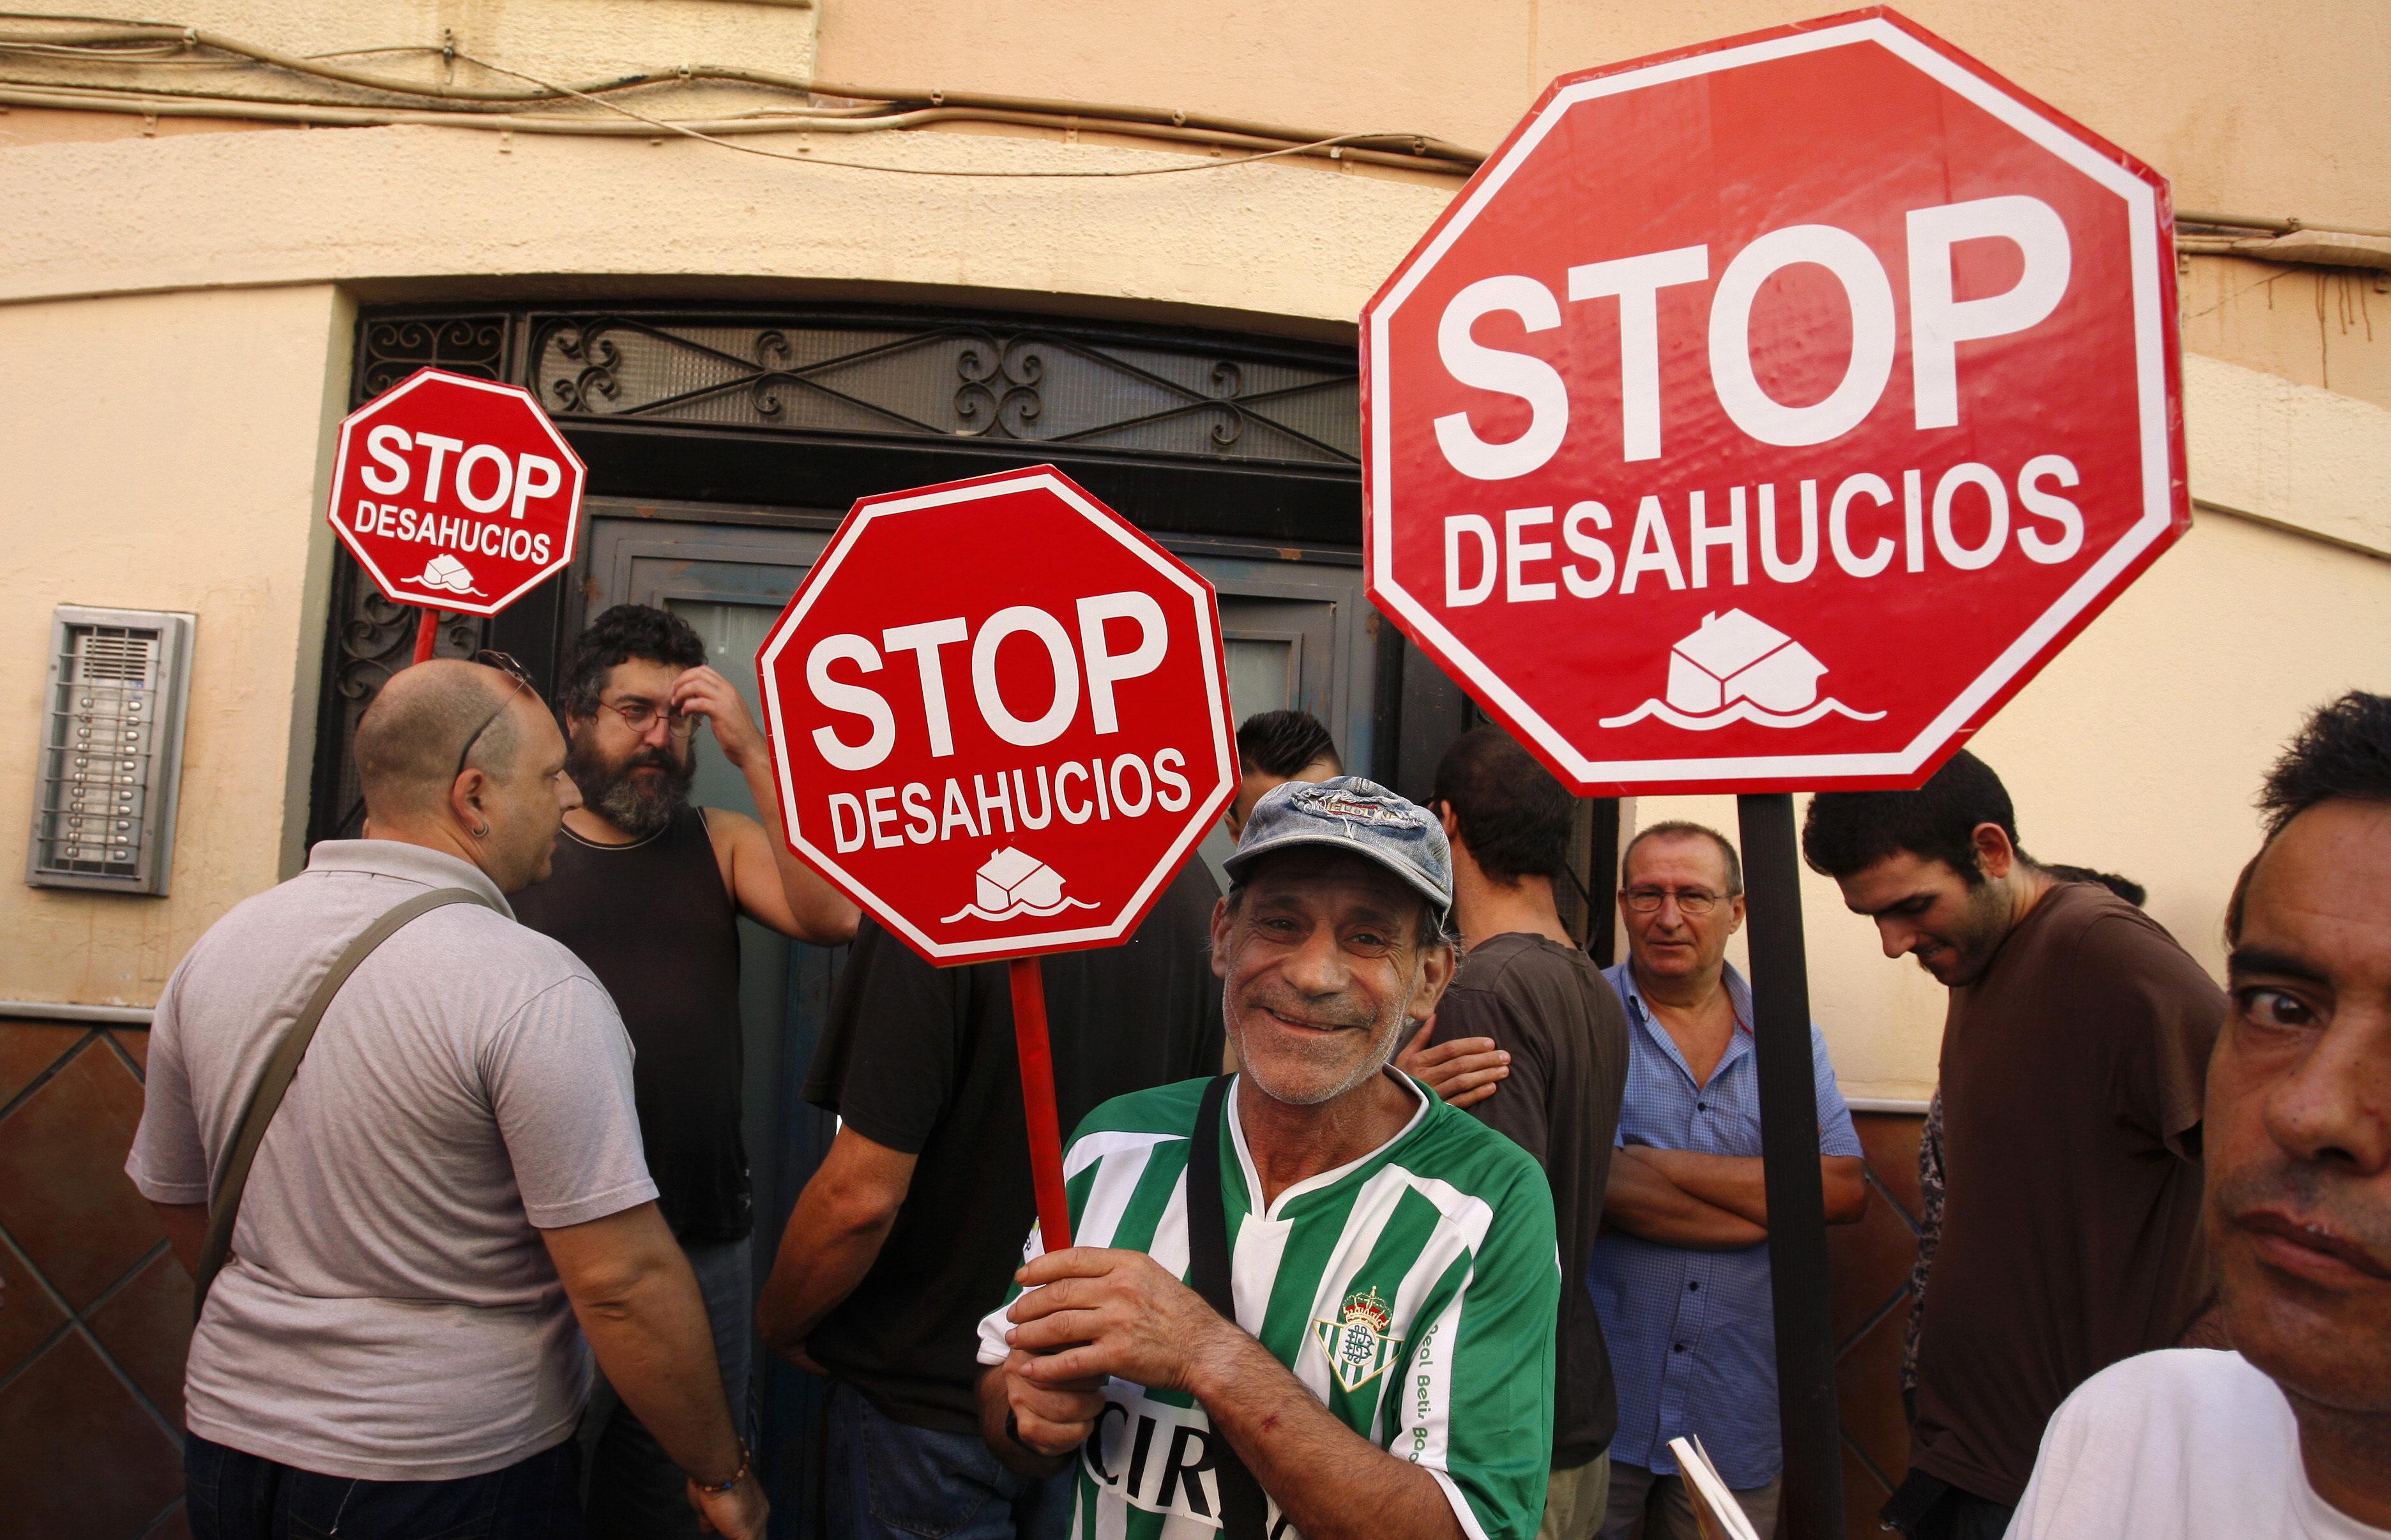 Rubalcaba: Lo constitucional es intentar ayudar a quien va a perder la casa